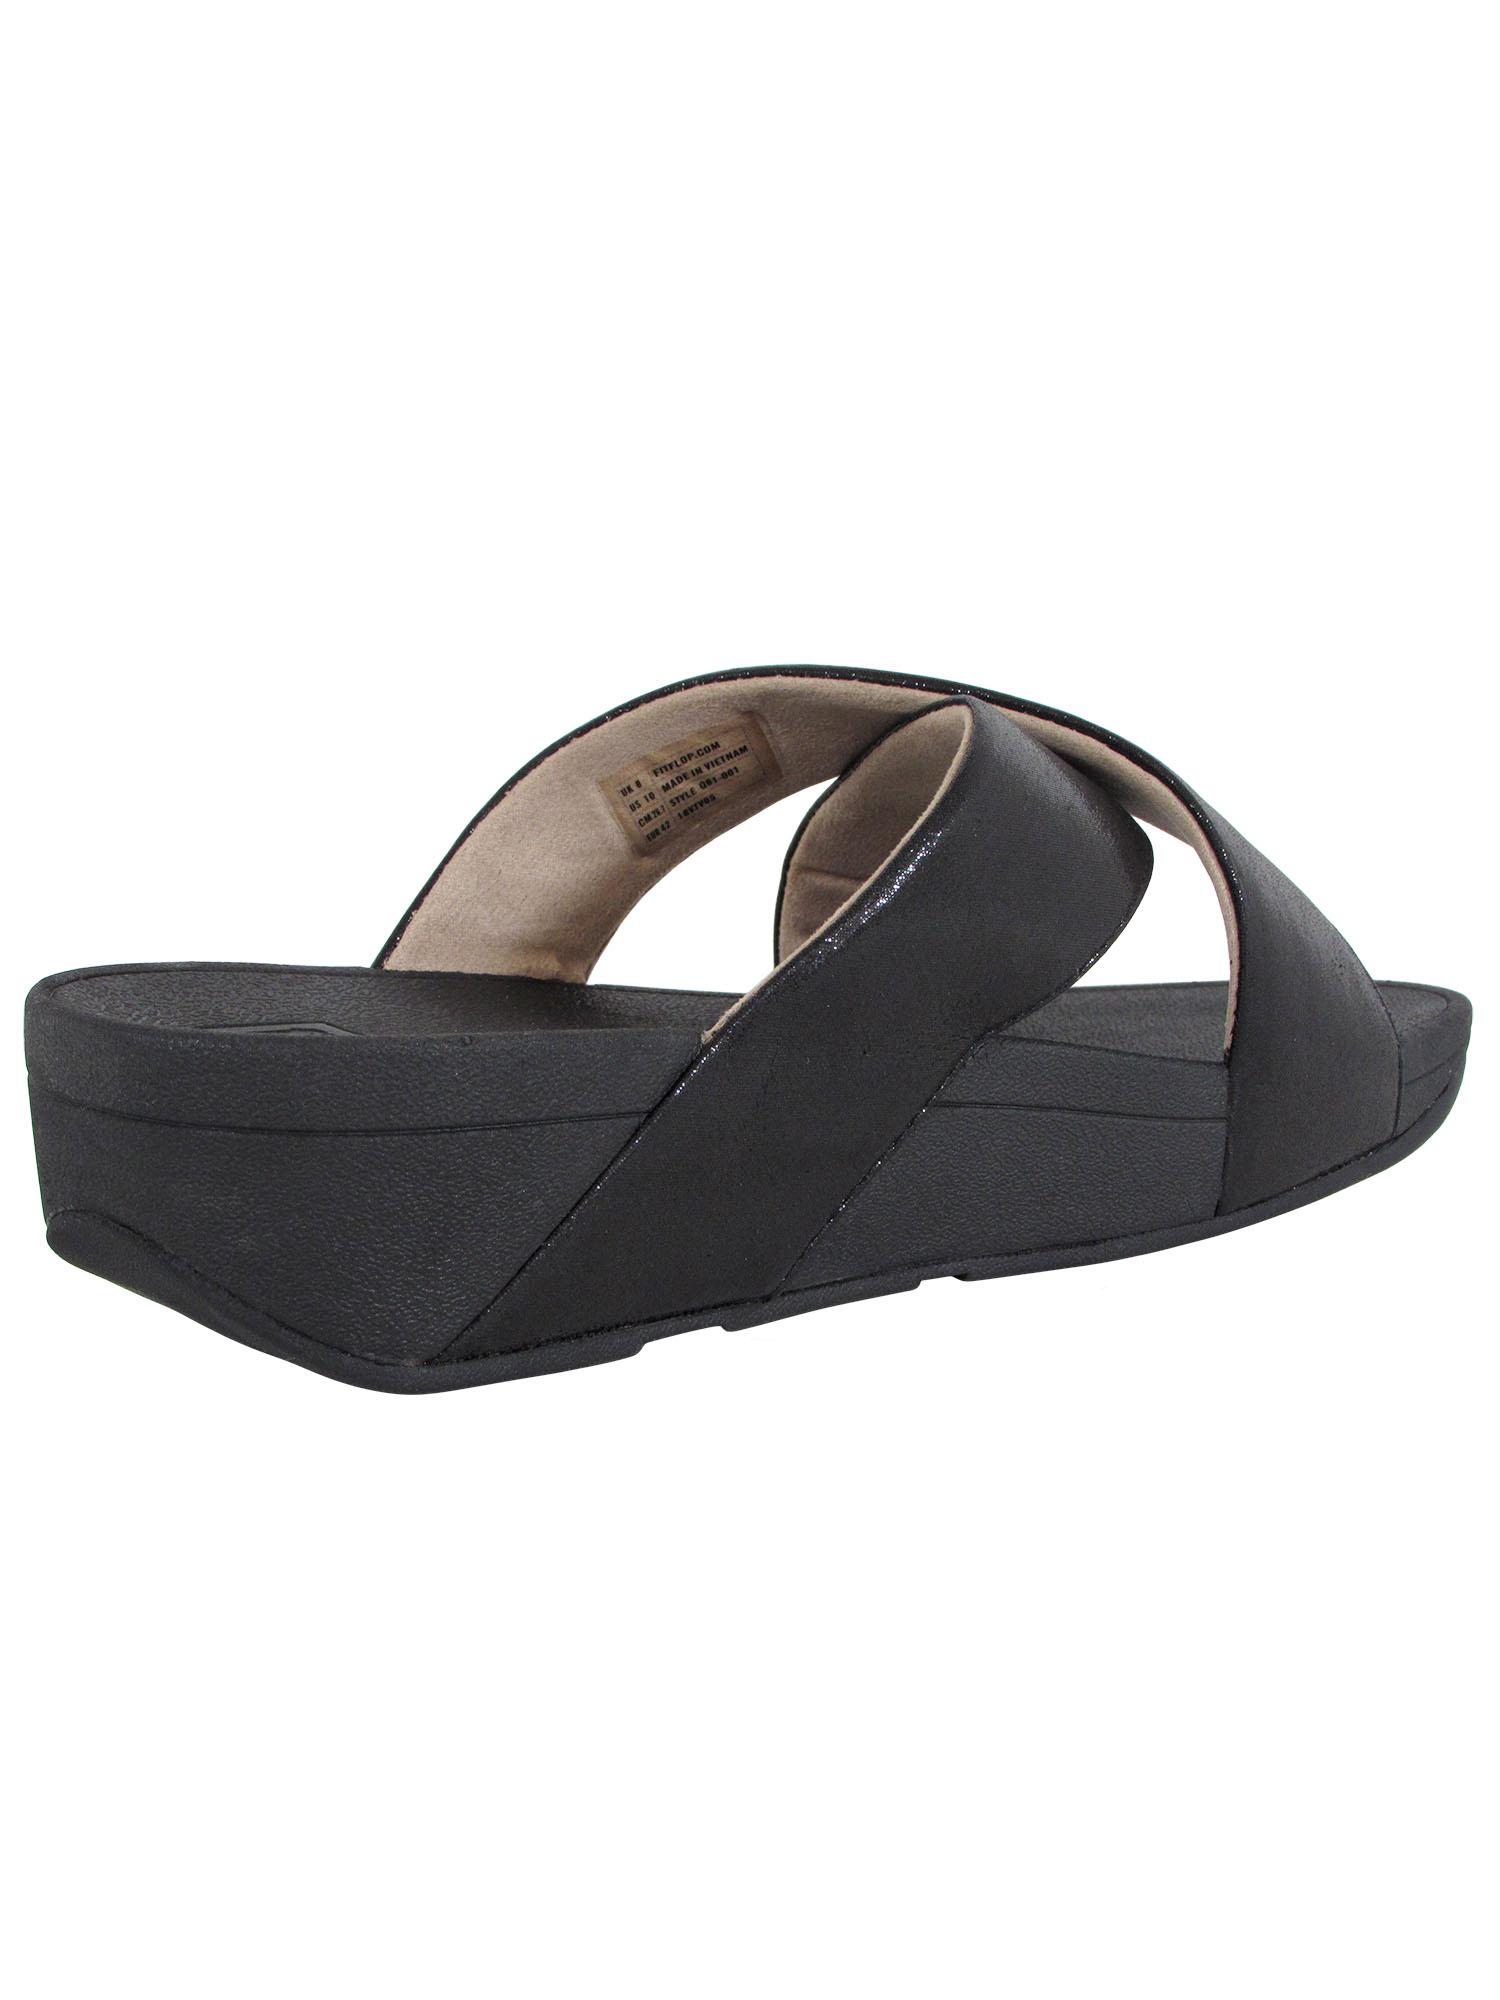 Fitflop-Womens-Lulu-Cross-Glitz-Slide-Sandal-Shoes thumbnail 4